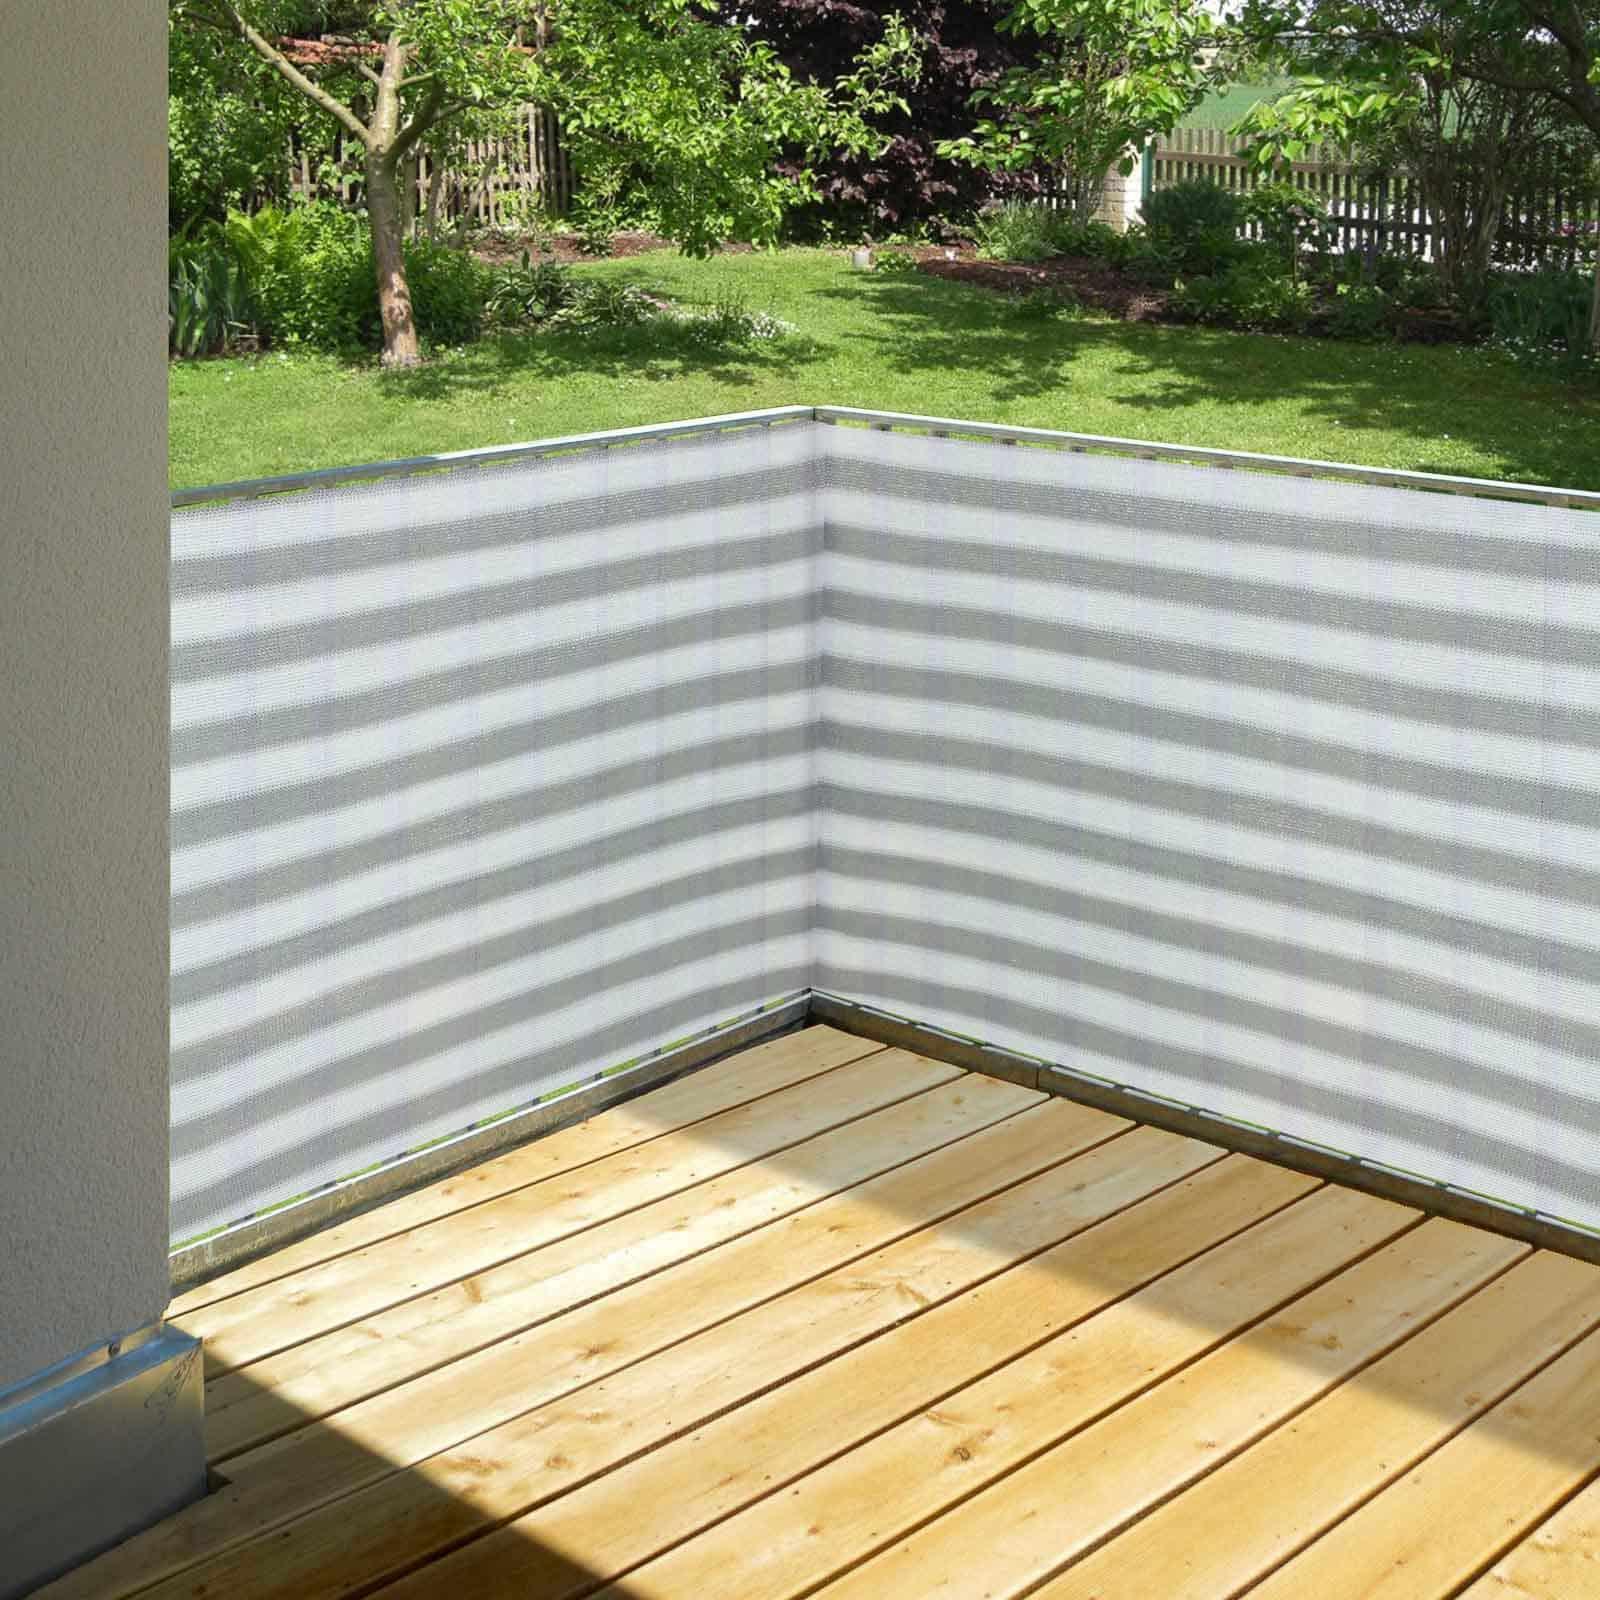 Hanse® Duurzaam Balkonscherm - Kleur Geel/Wit - Balkondoek - 500x90cm